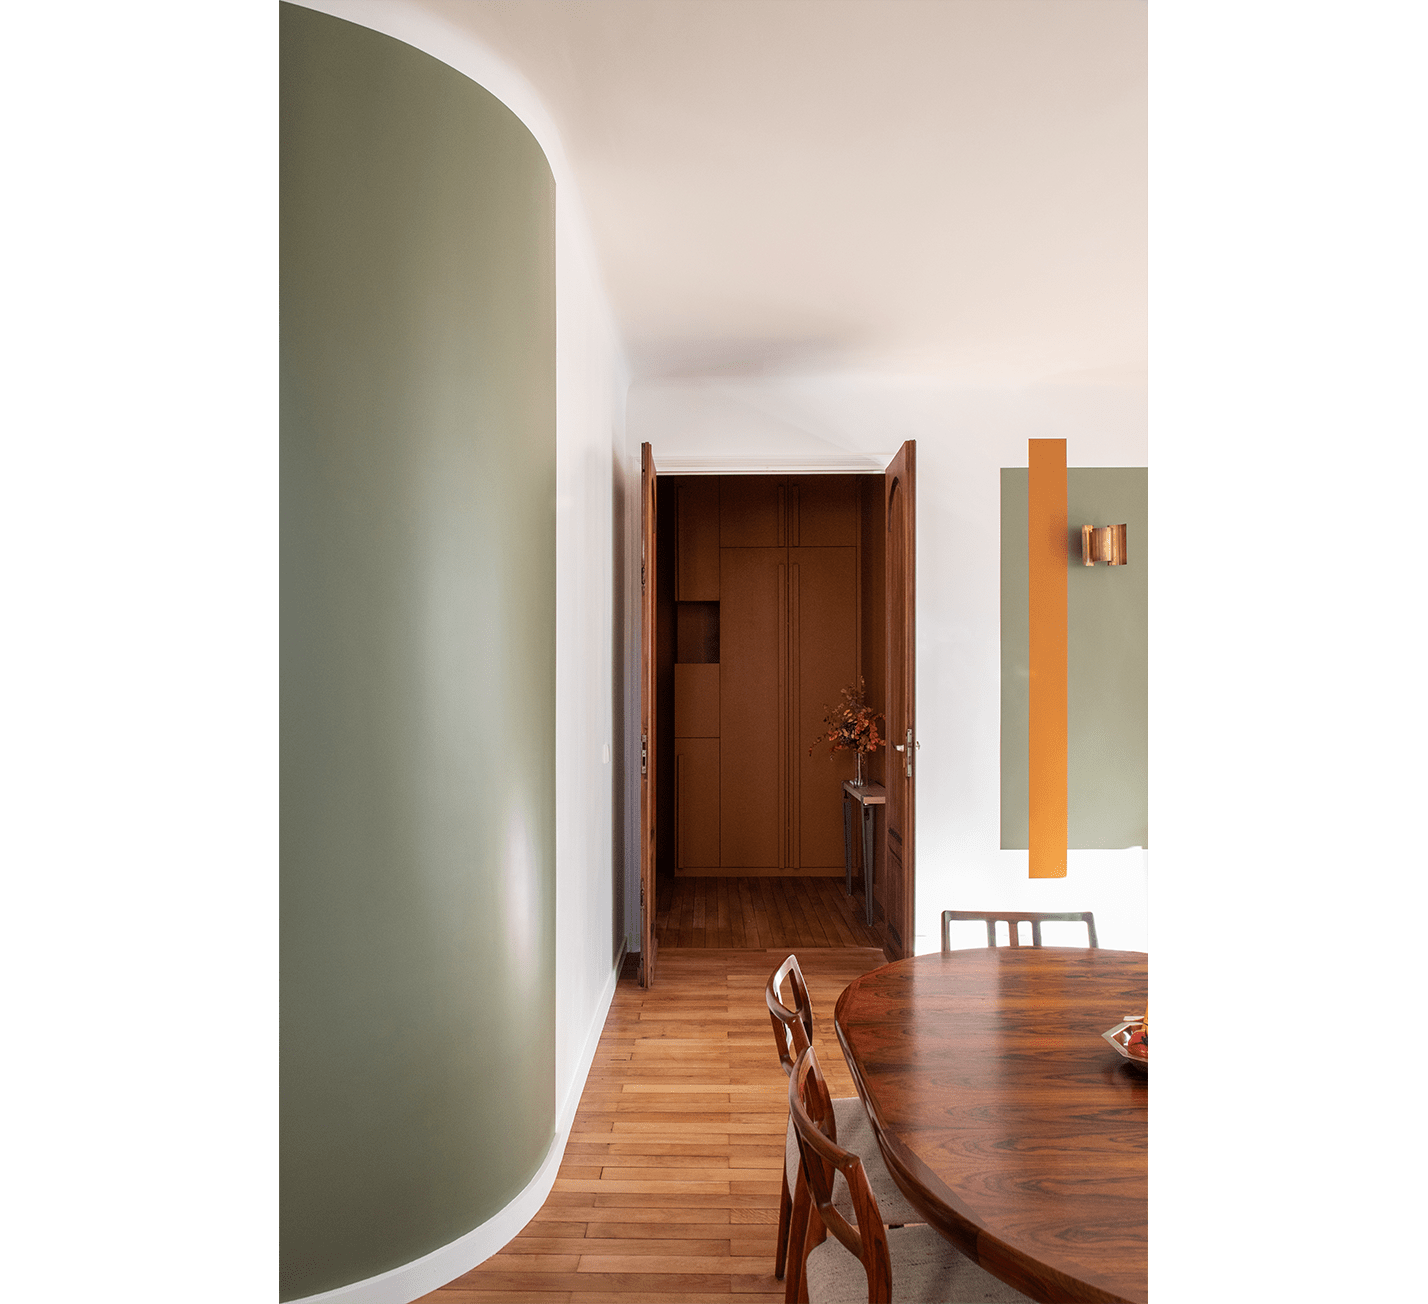 Projet-Emile-Atelier-Steve-Pauline-Borgia-Architecte-interieur-14-min